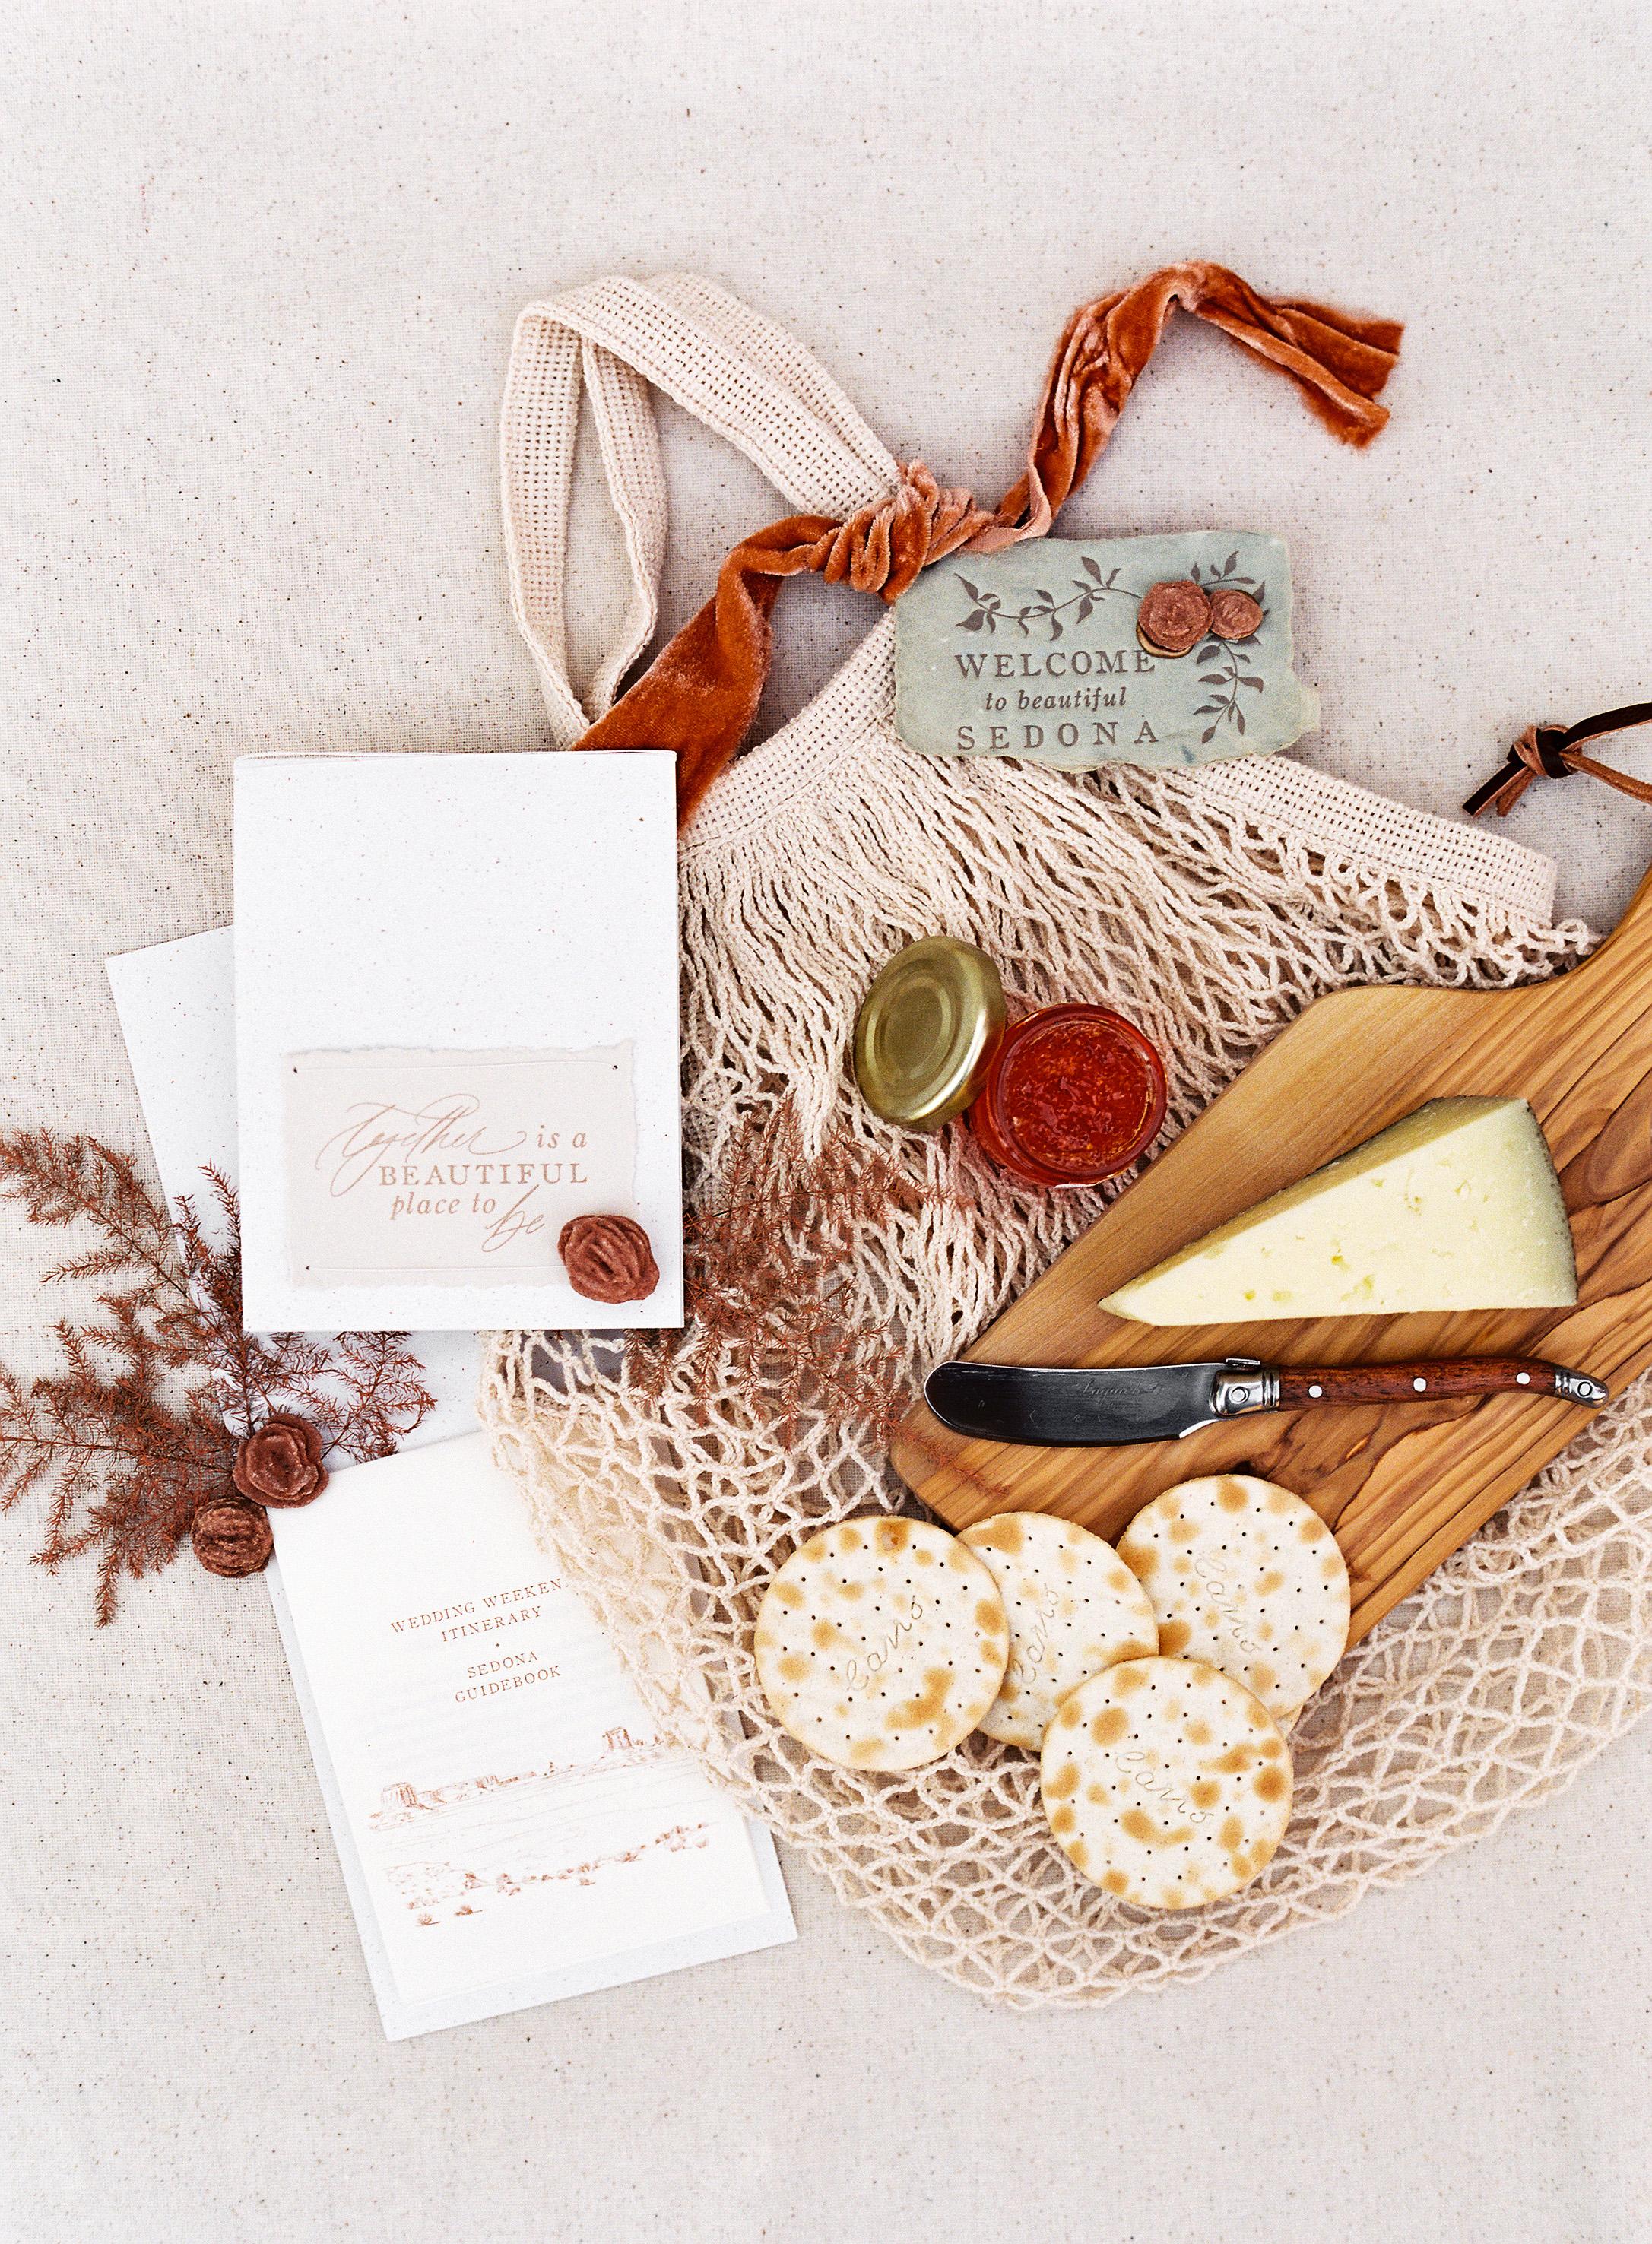 stefanie terrel wedding welcome bag